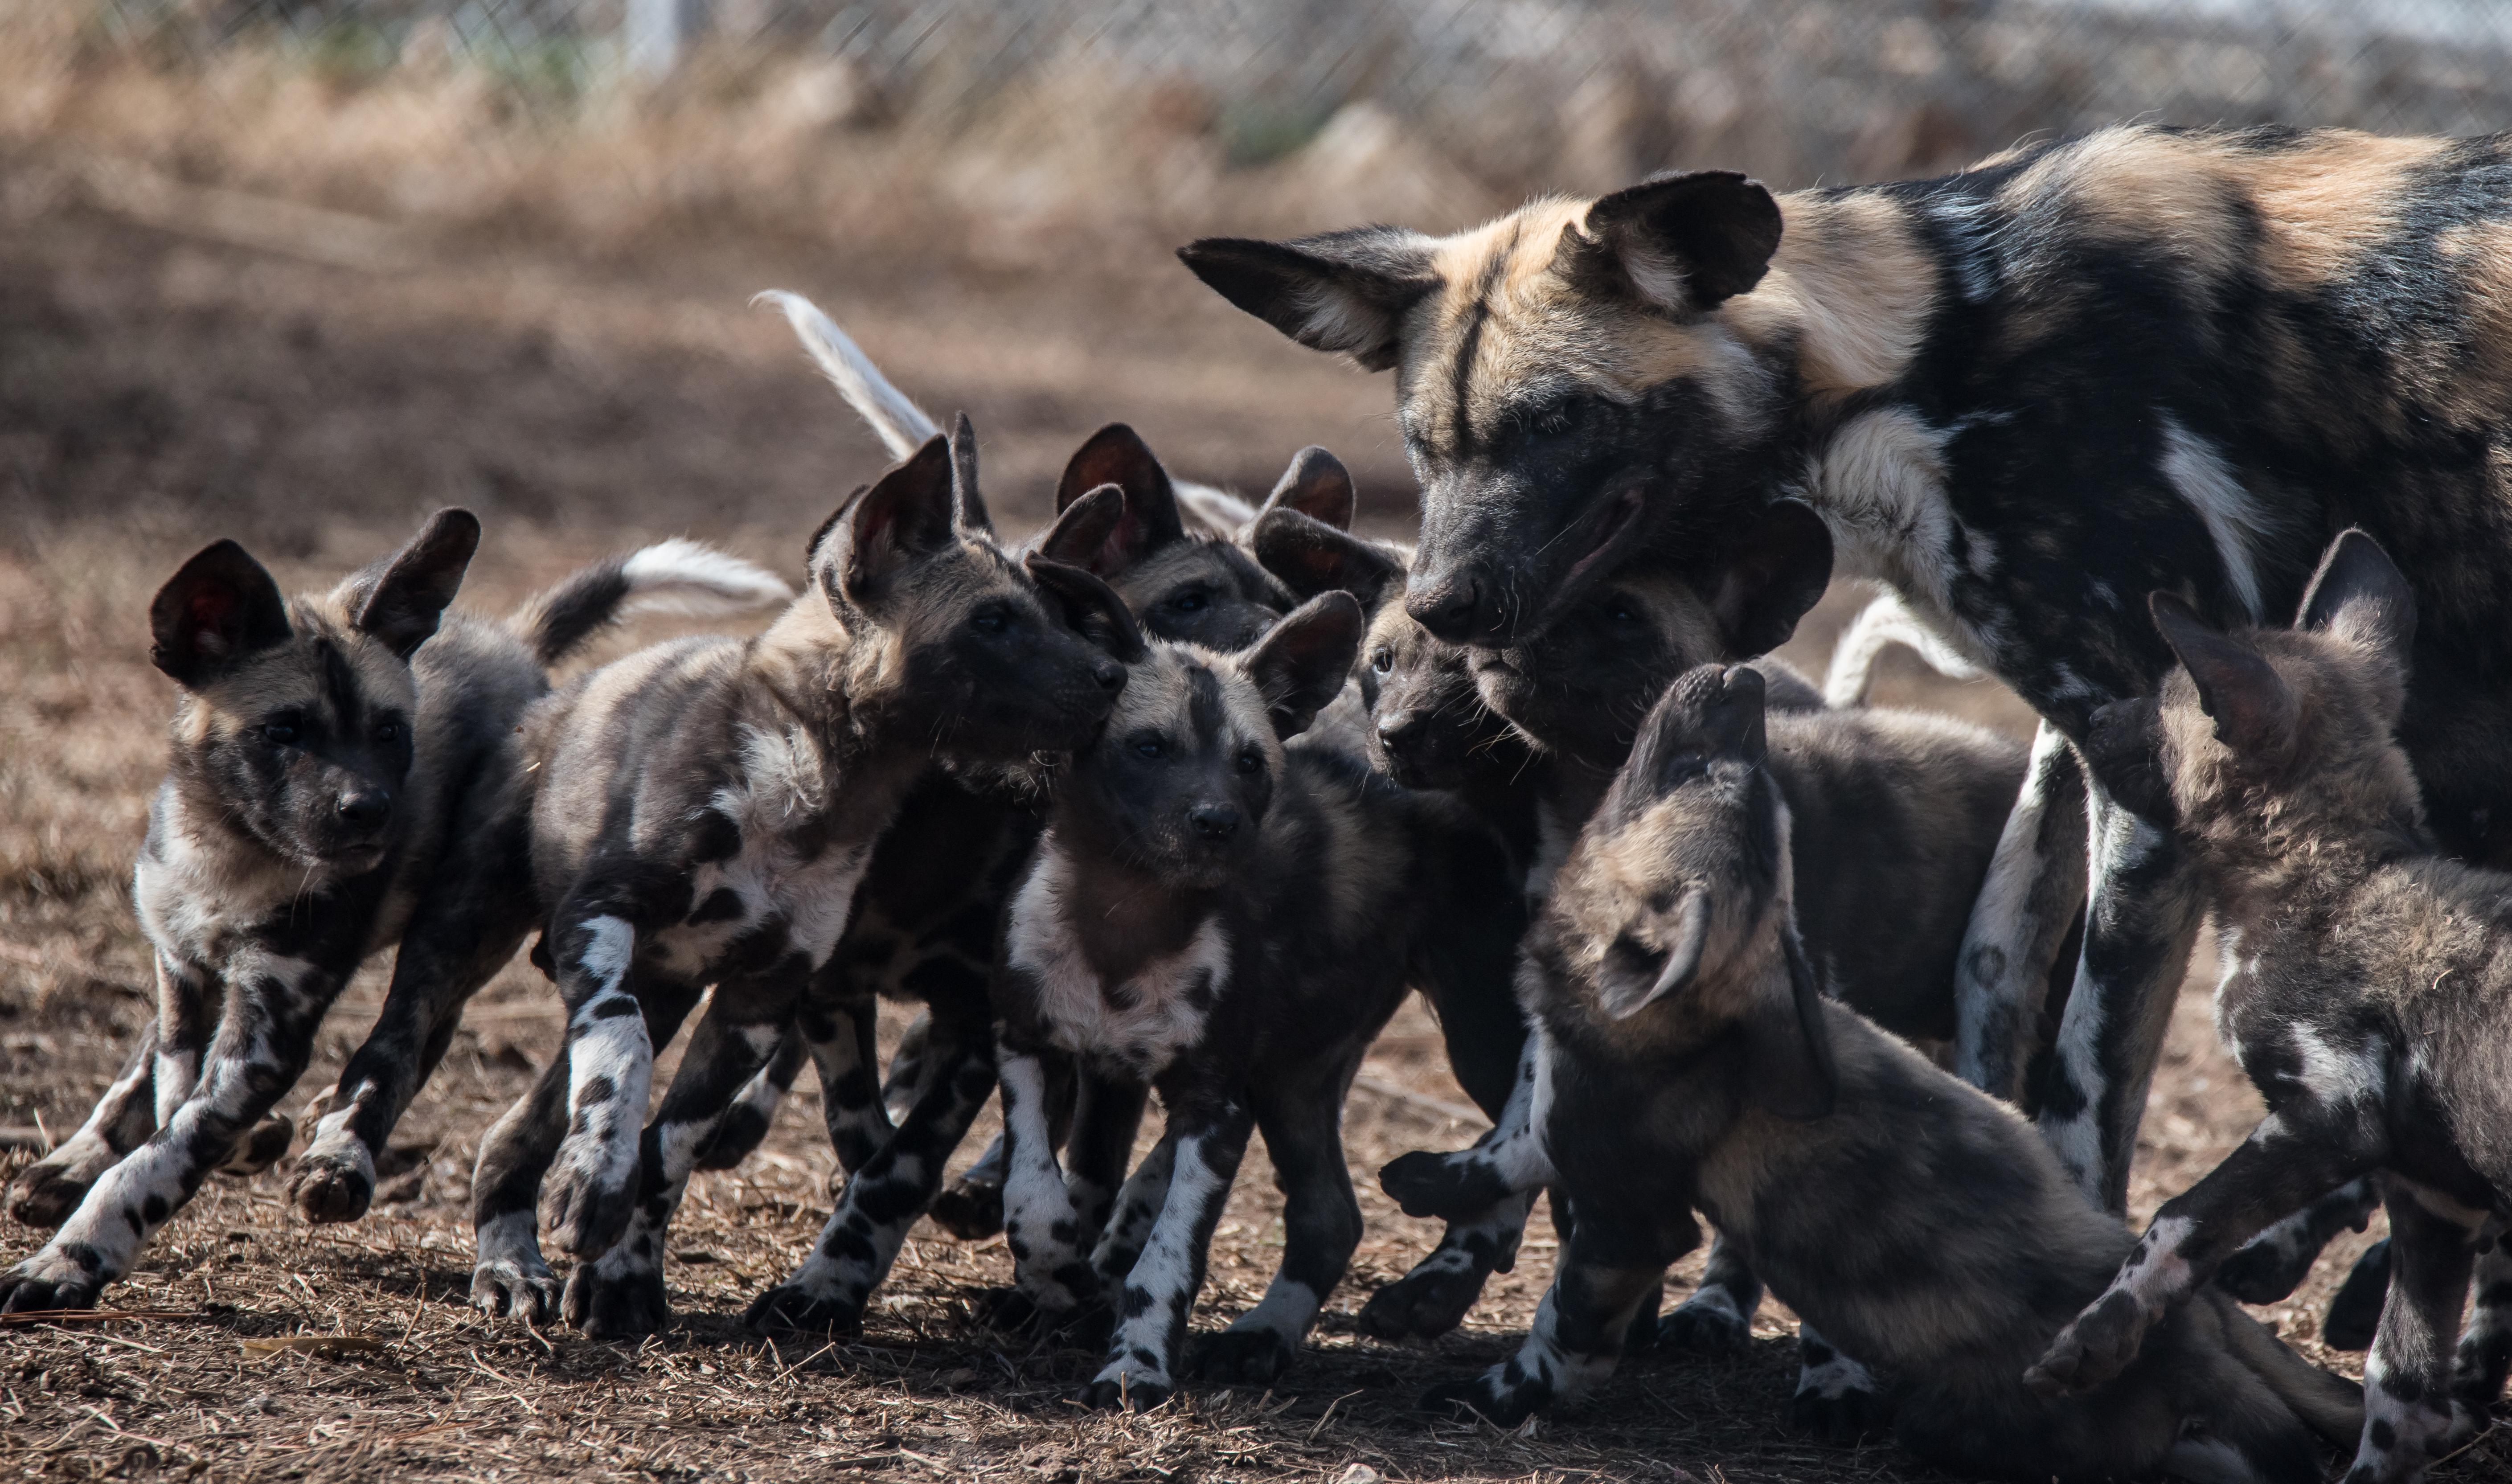 oklahoma city zoo the explorer in you hero dogs